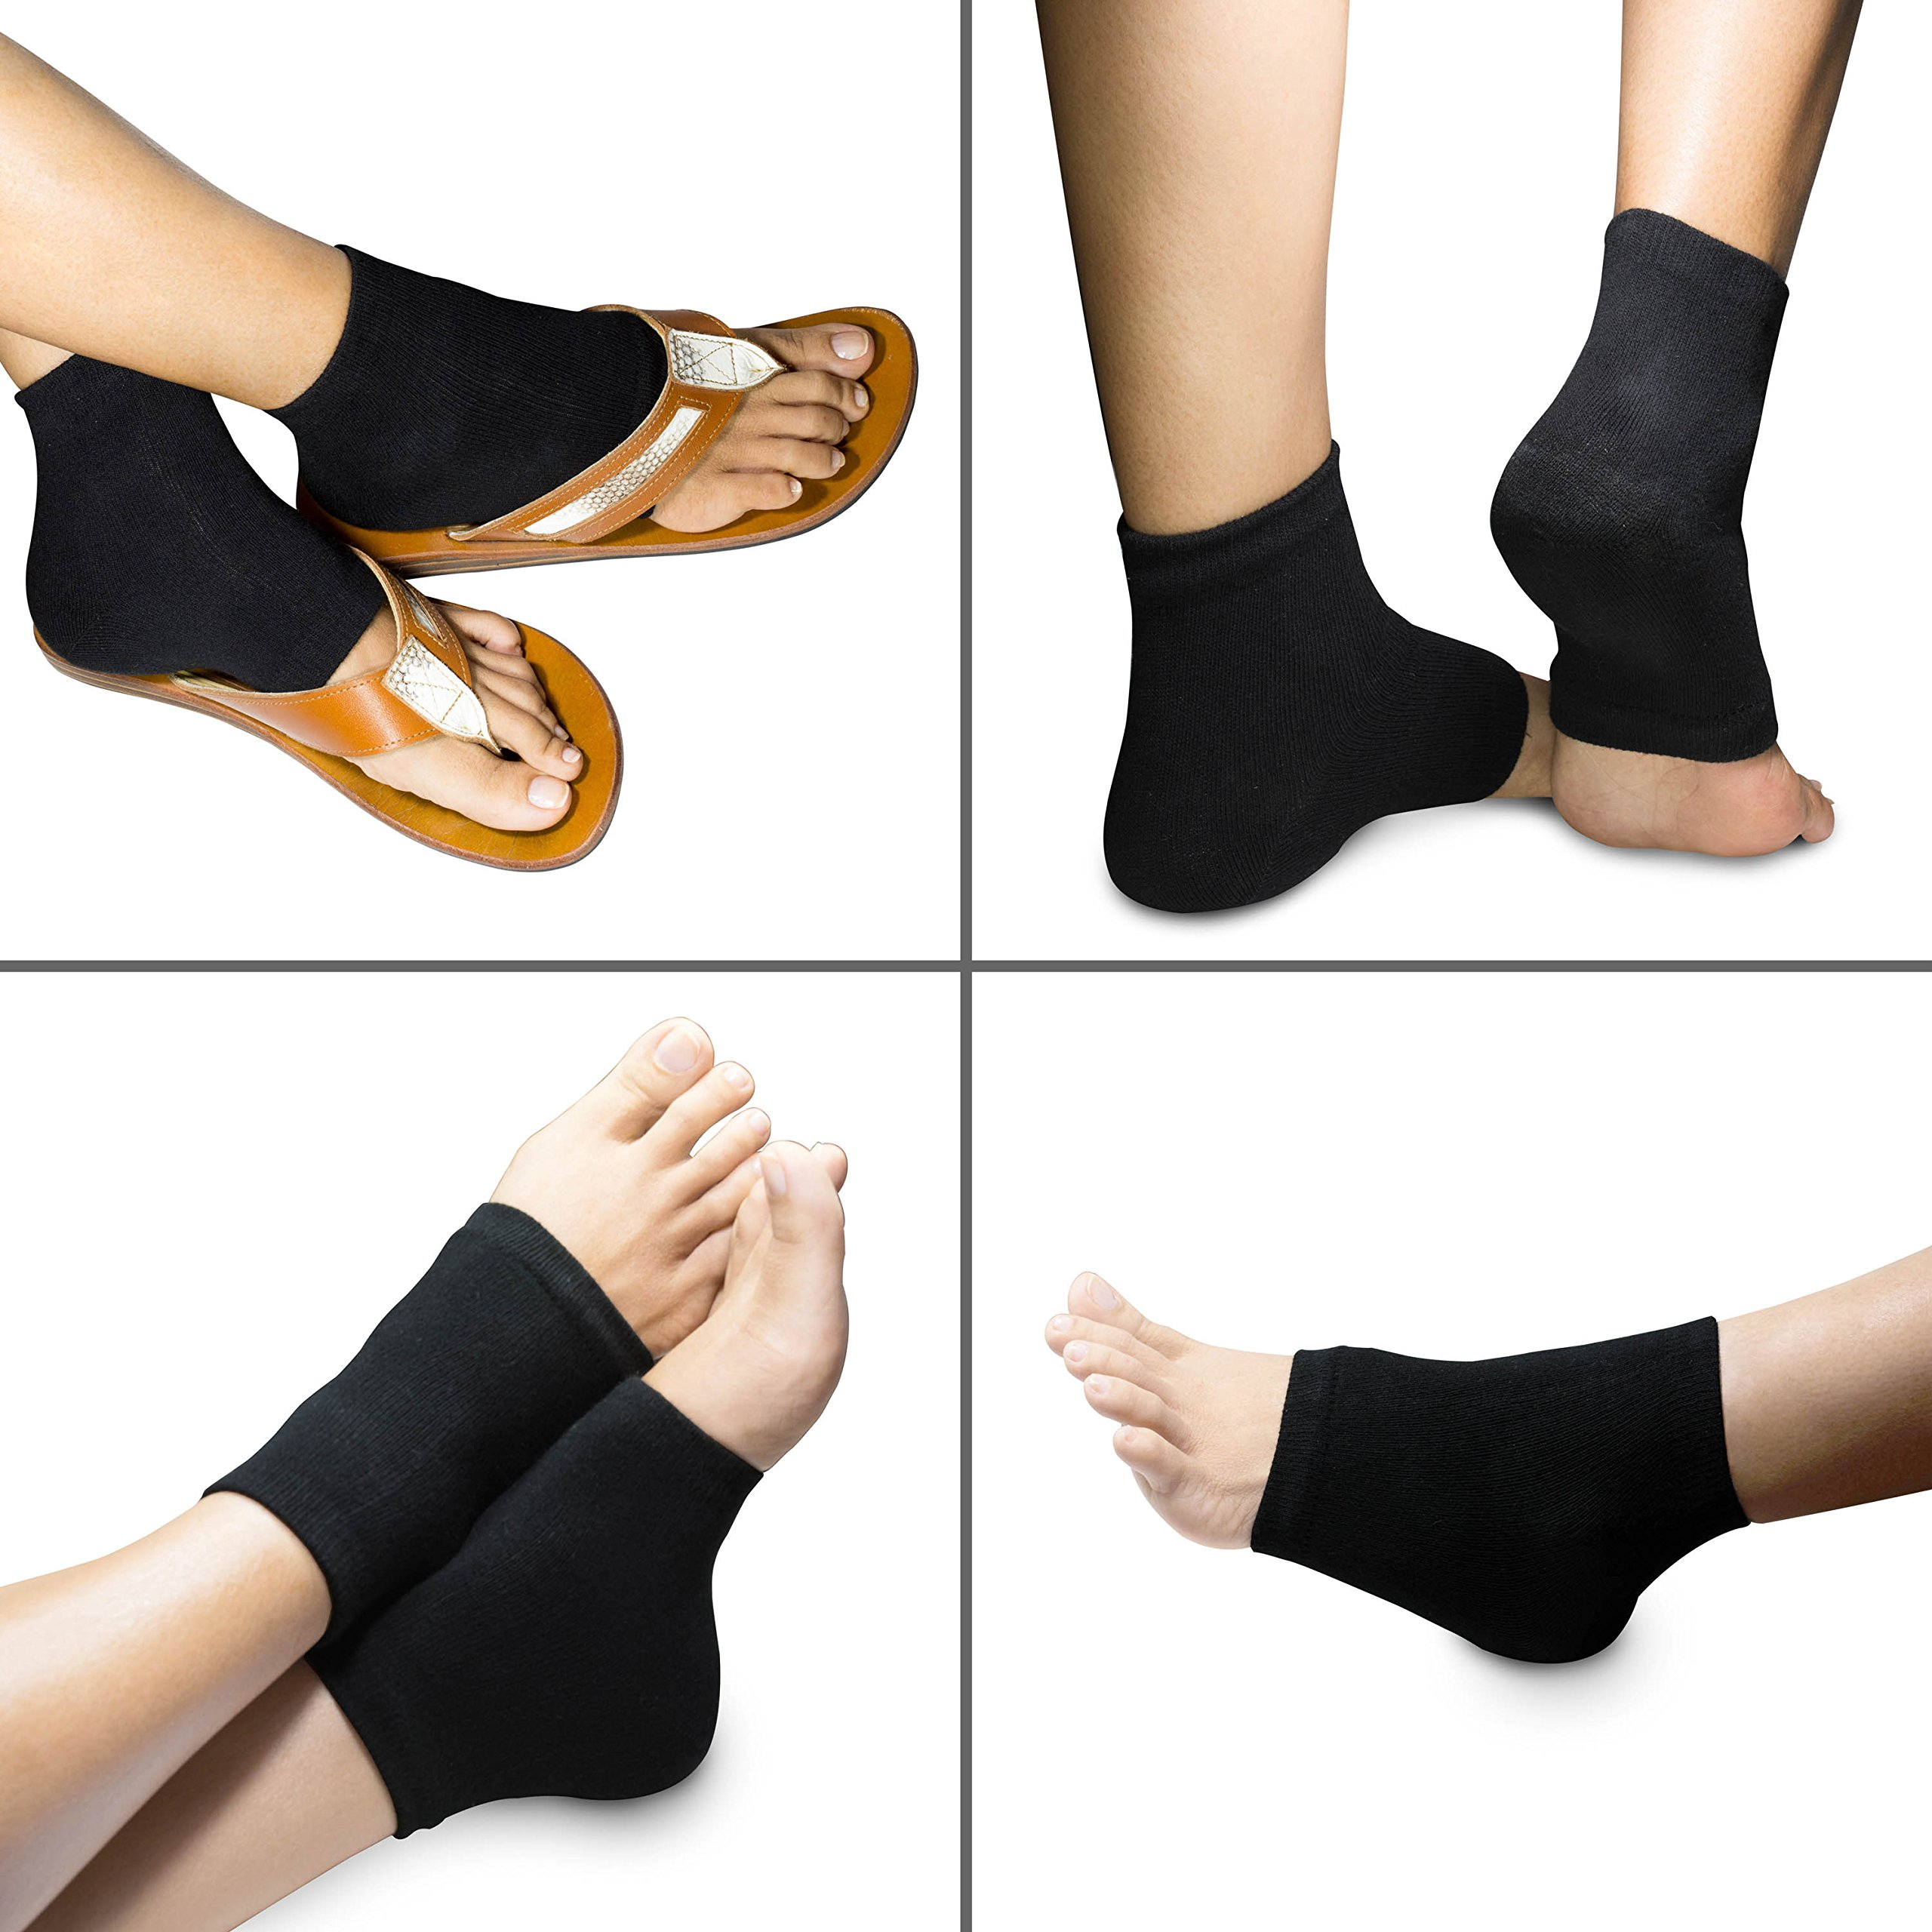 3 PAIRS-Moisturizing Gel Heel Socks w/ Enriched Vitamins for Dry Hard Cracked Heels & DIY Simple Home Remedies by Triim Fitness by Triim Fitness (Image #8)